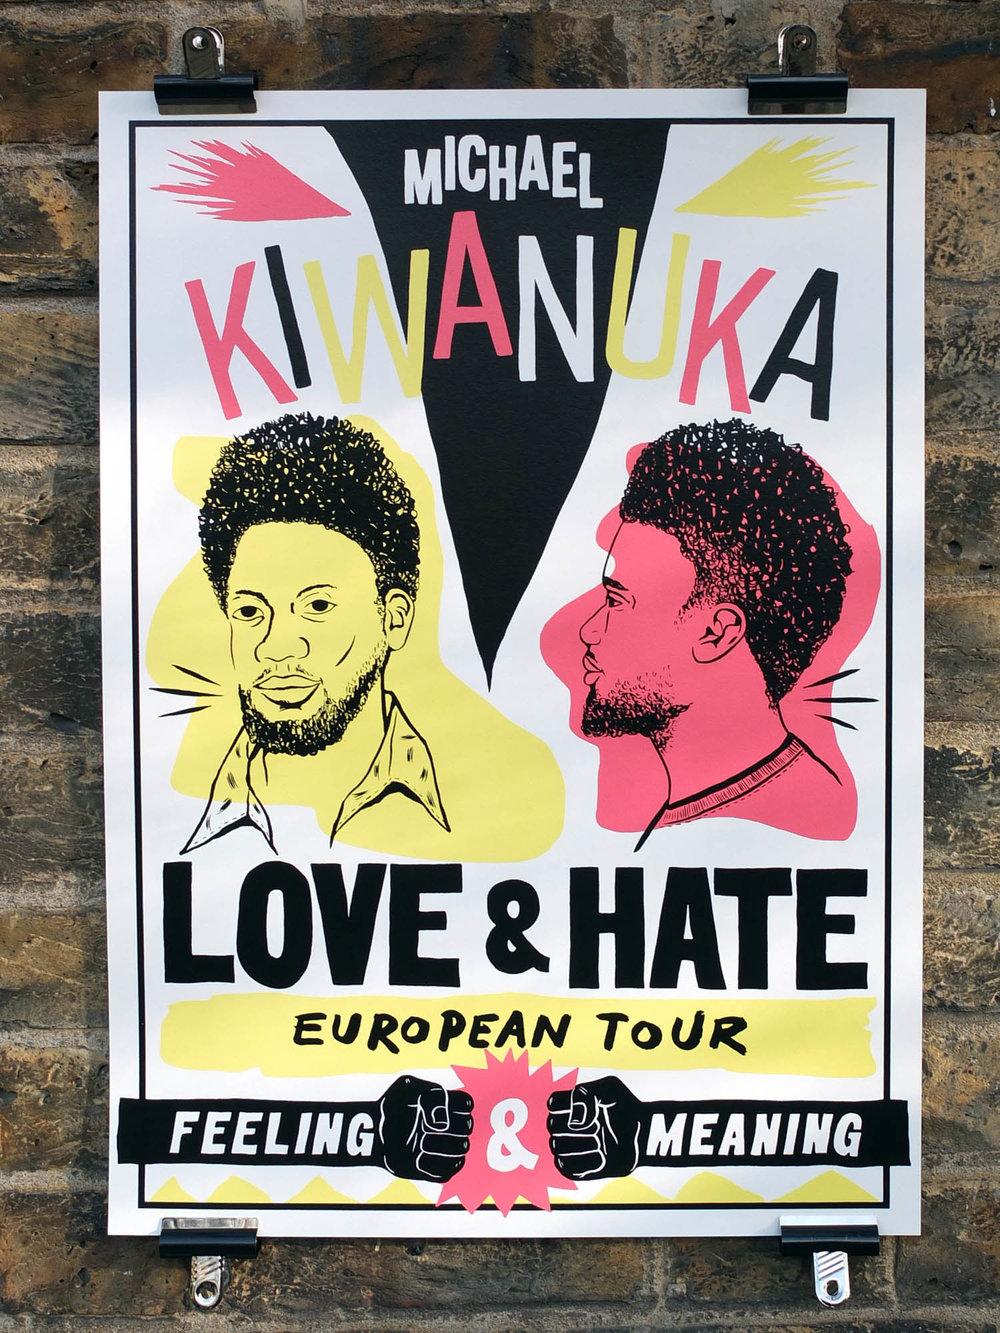 Michael Kiwanuka Stevie Gee Screen Printed Tour Poster